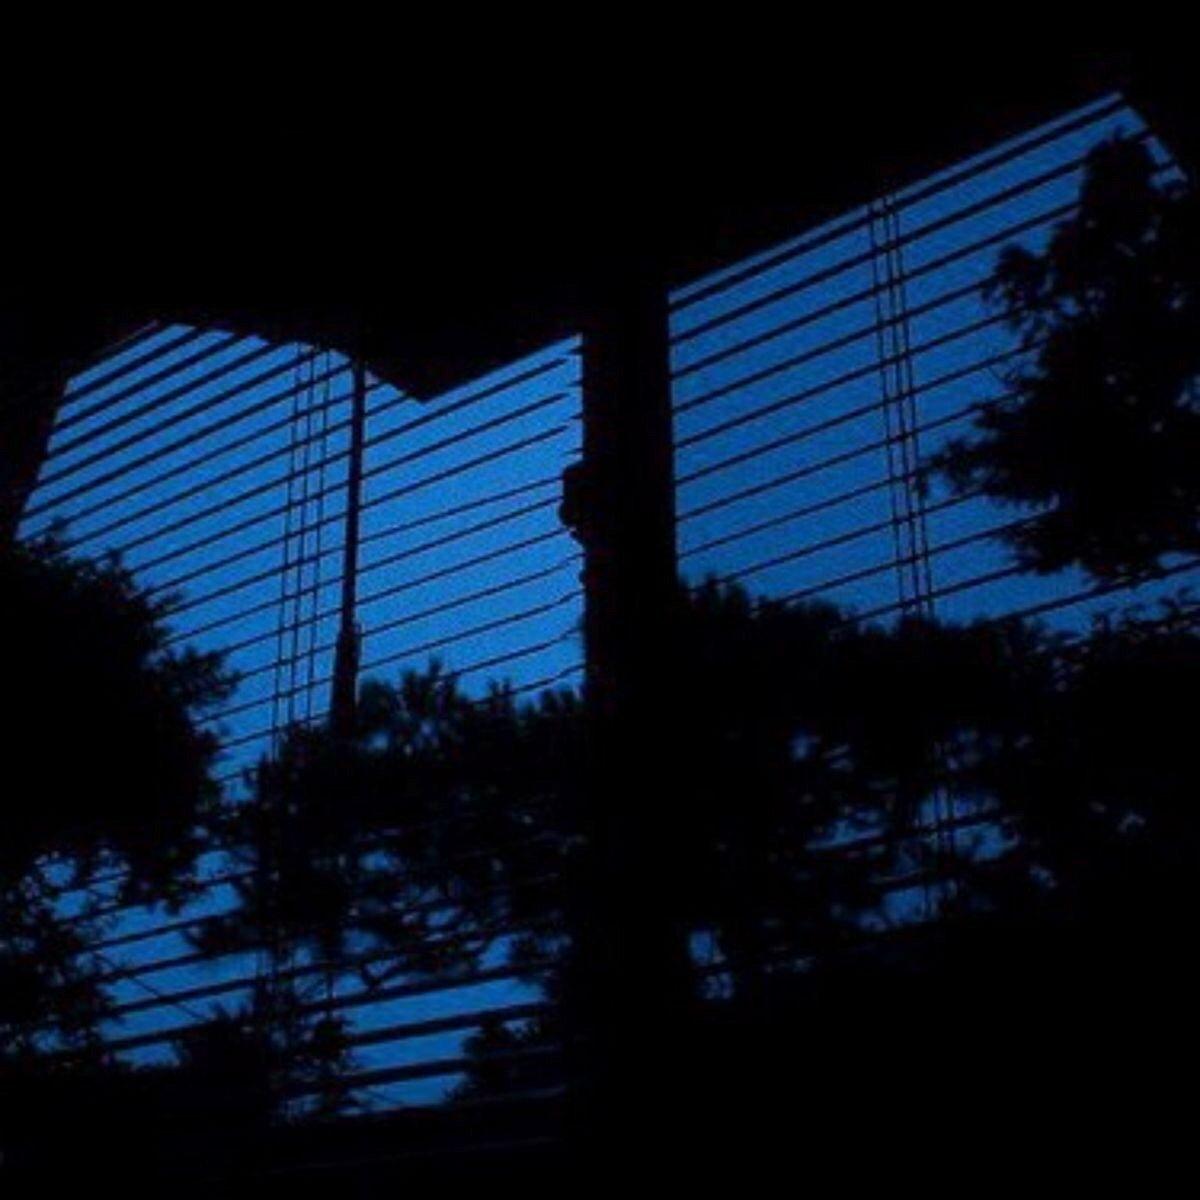 Dark Blue Aesthetic Tumblr Austria Spa Hotel Luxury